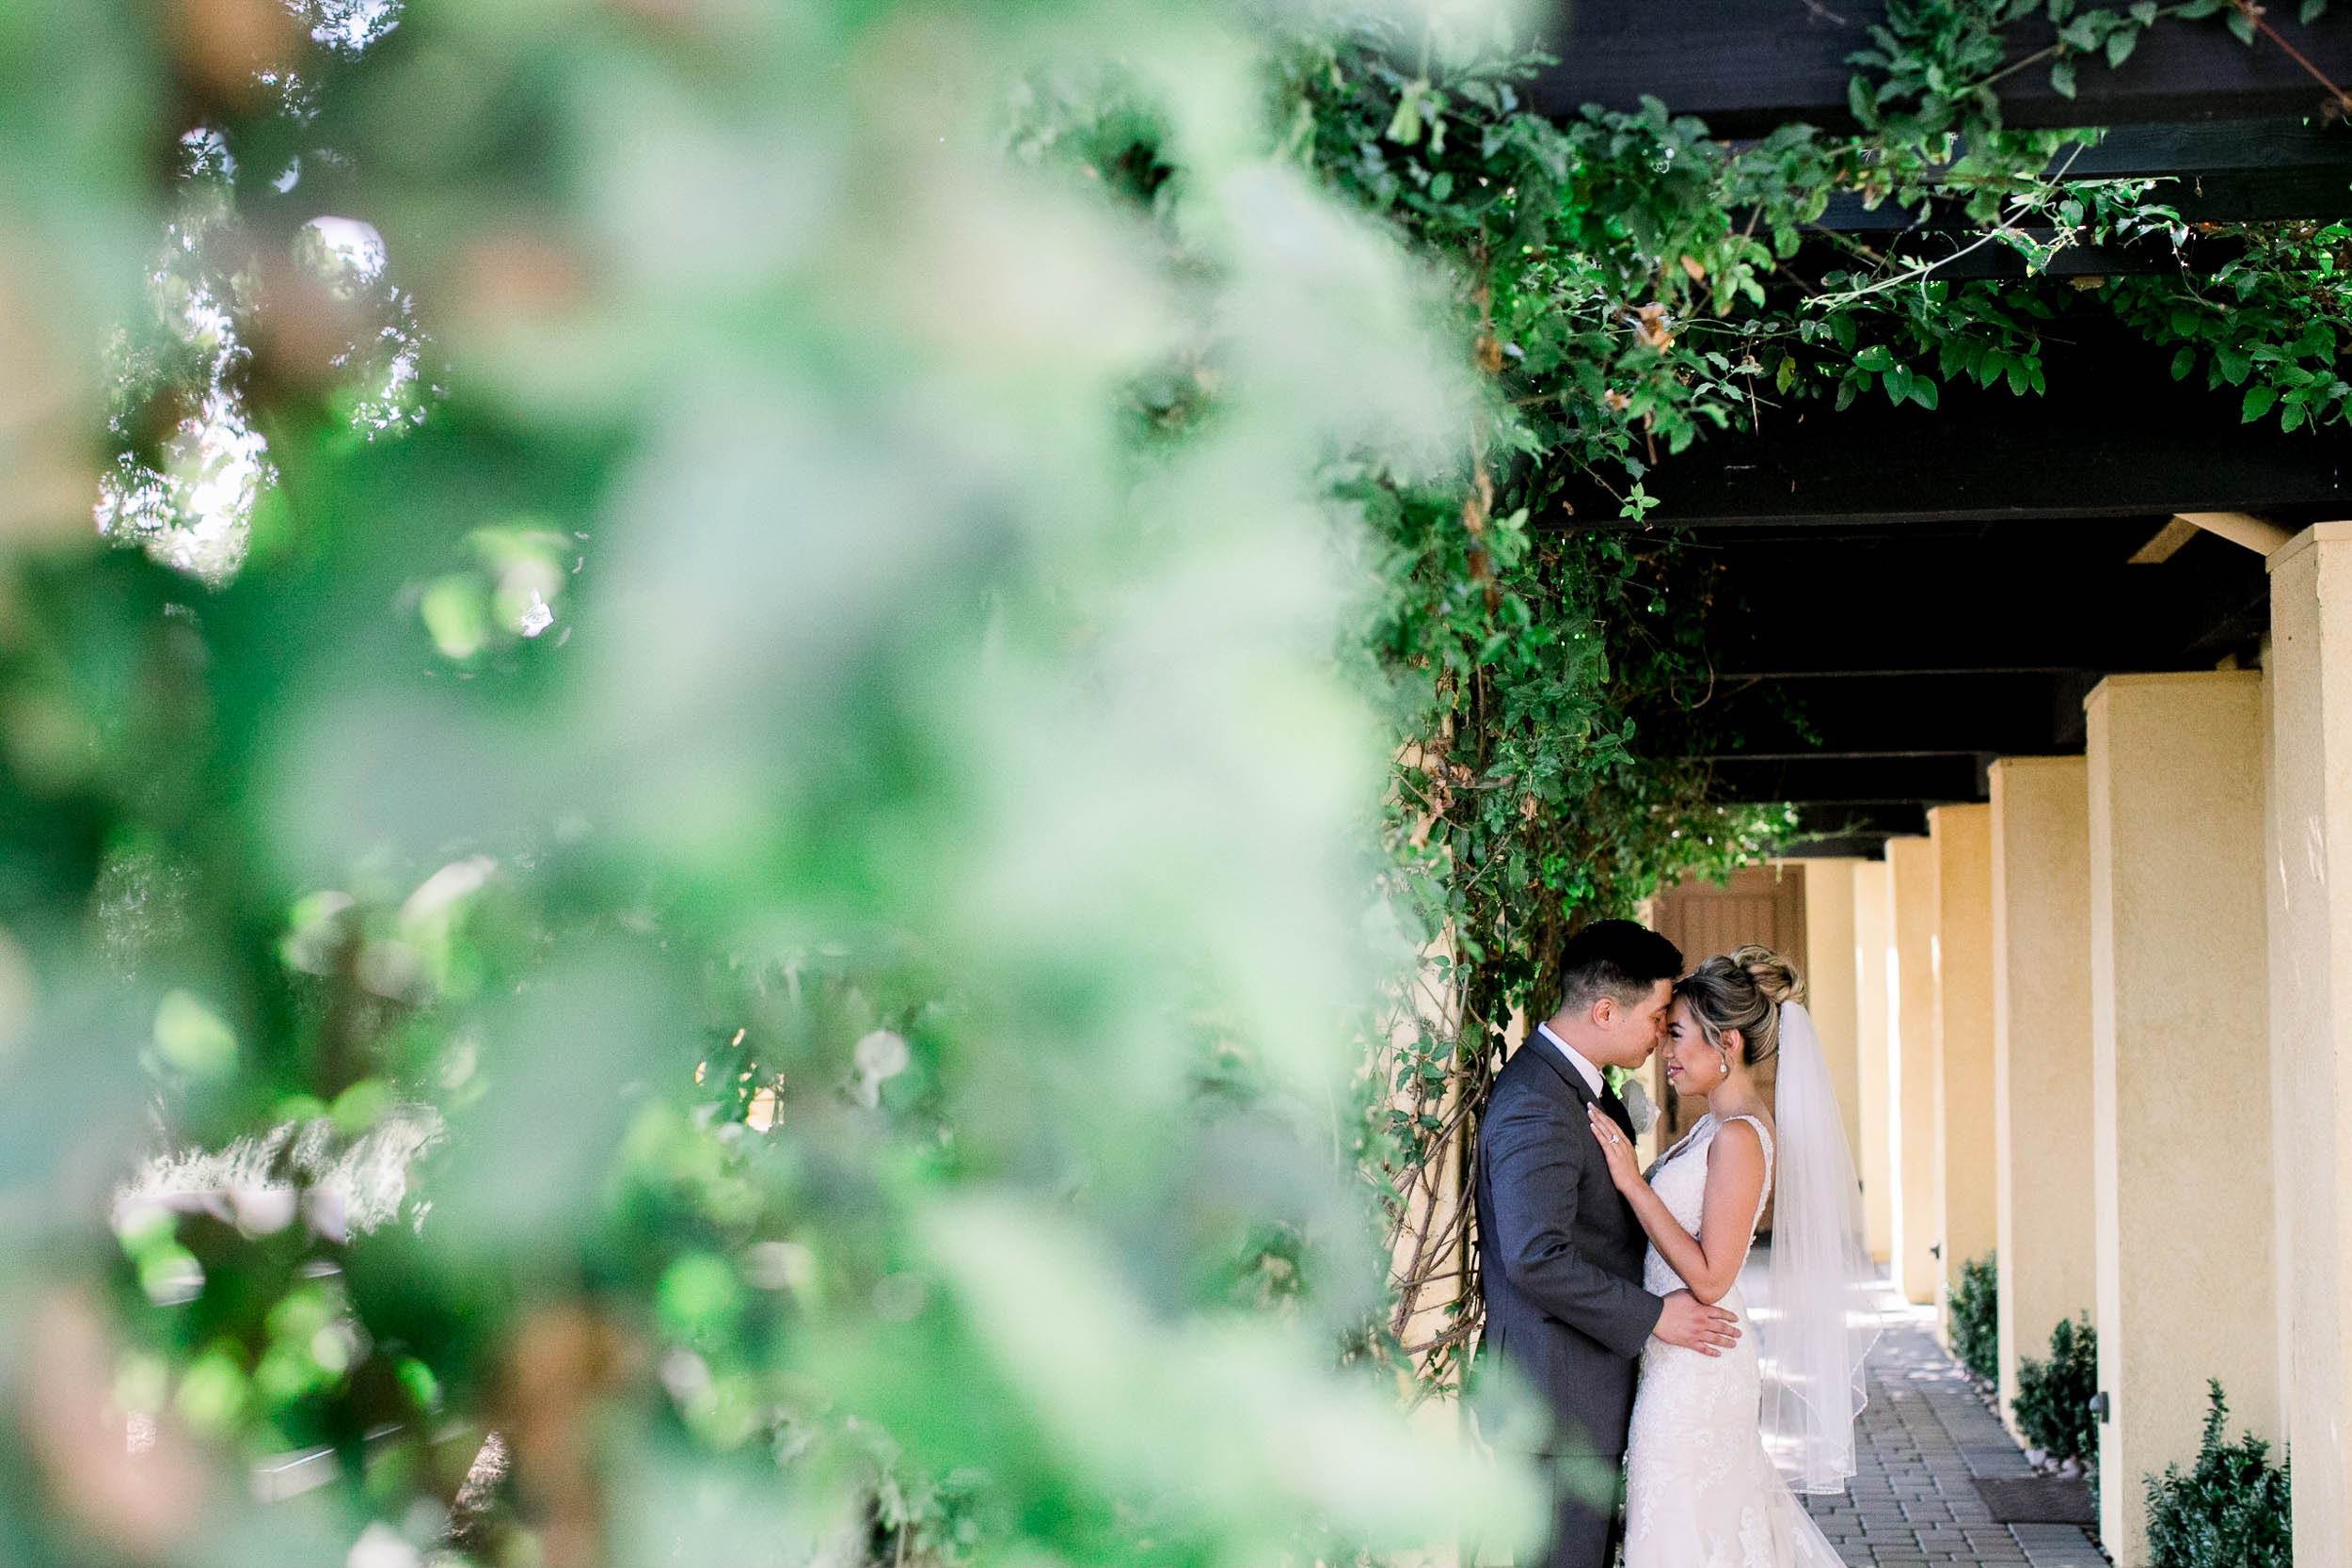 Las Positas Wedding_Buena Lane Photography_090118ER151.jpg